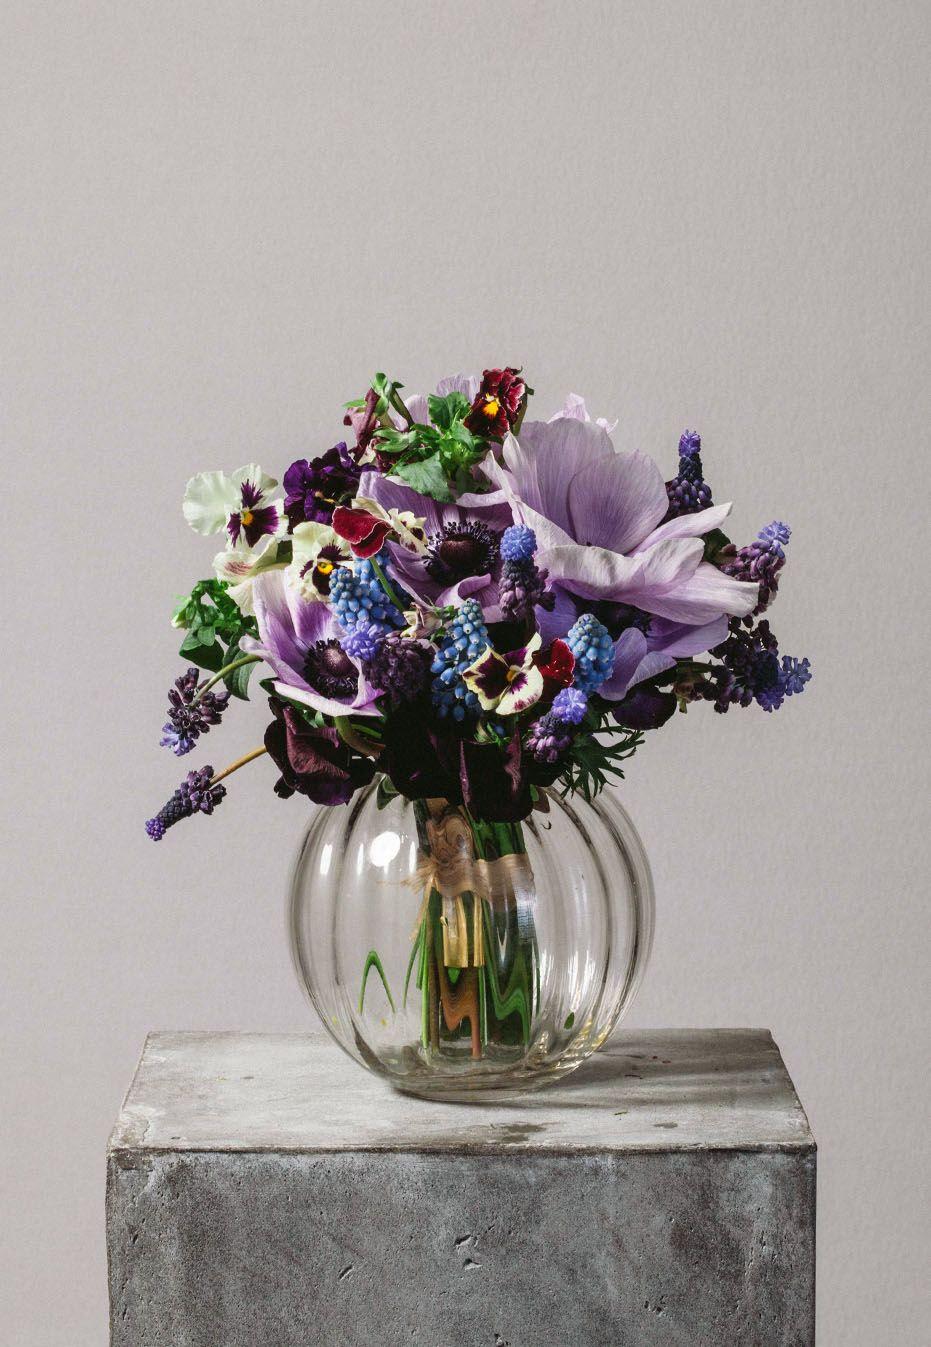 Deliver Roses, Peonies, Hydrangeas, Dahlia, Lilies